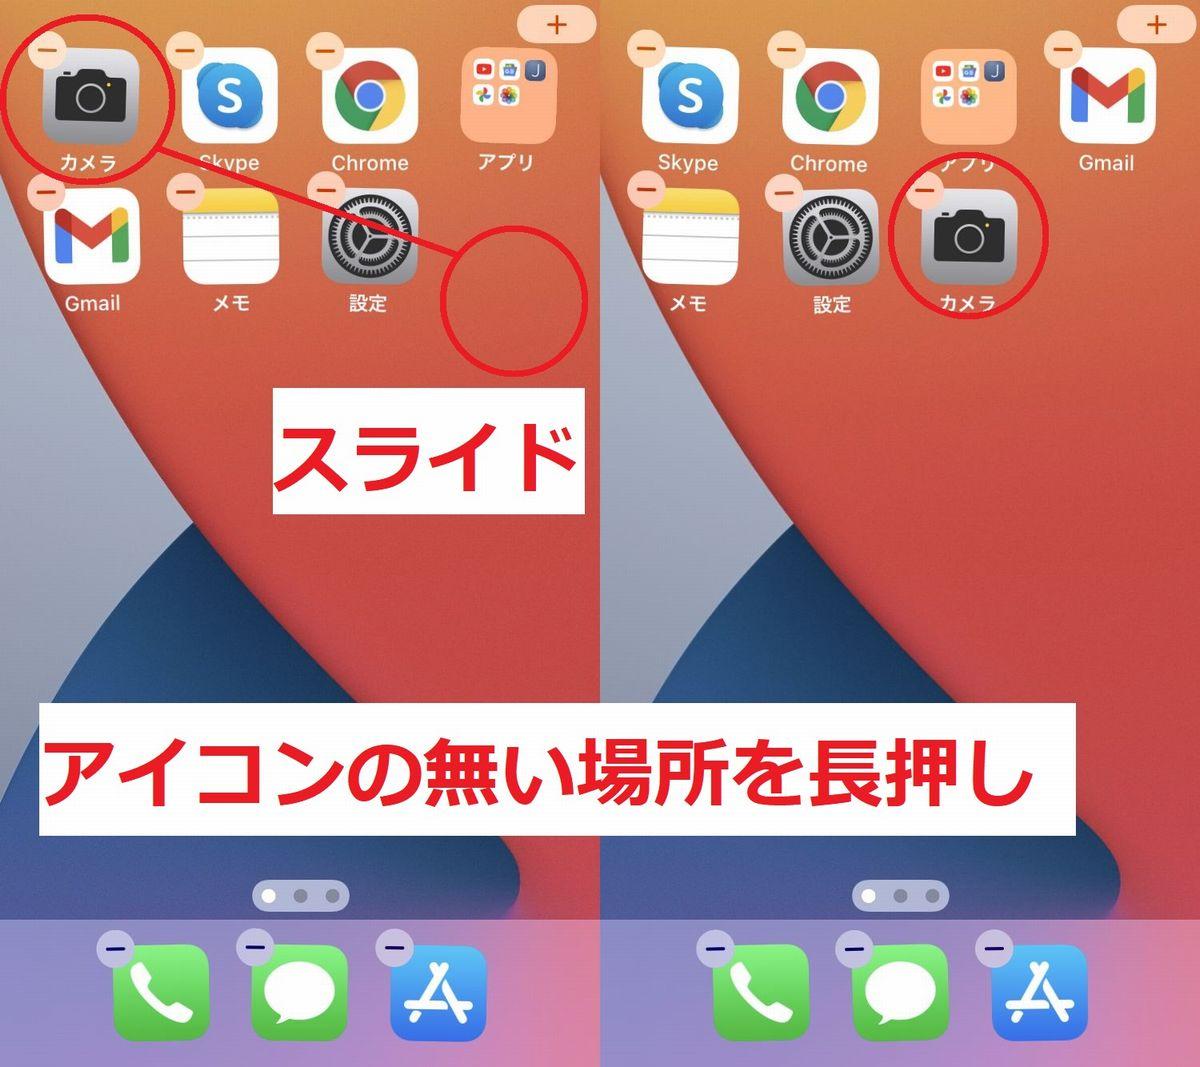 iPhoneのアイコン移動